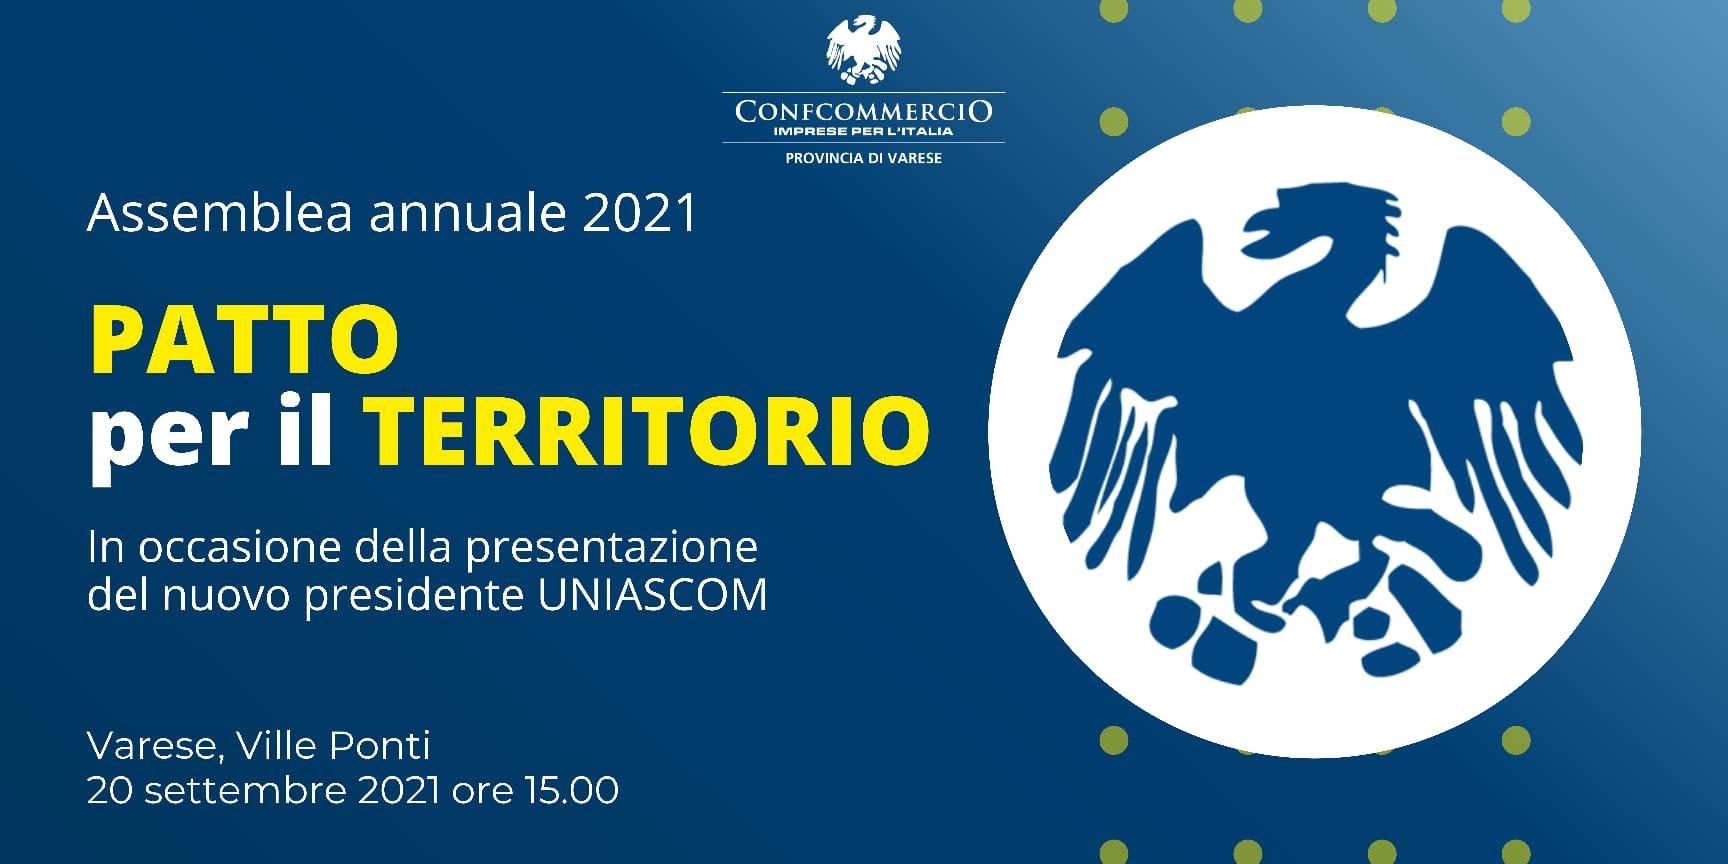 Assembleaannuale2021Confcommercioprovinciadi